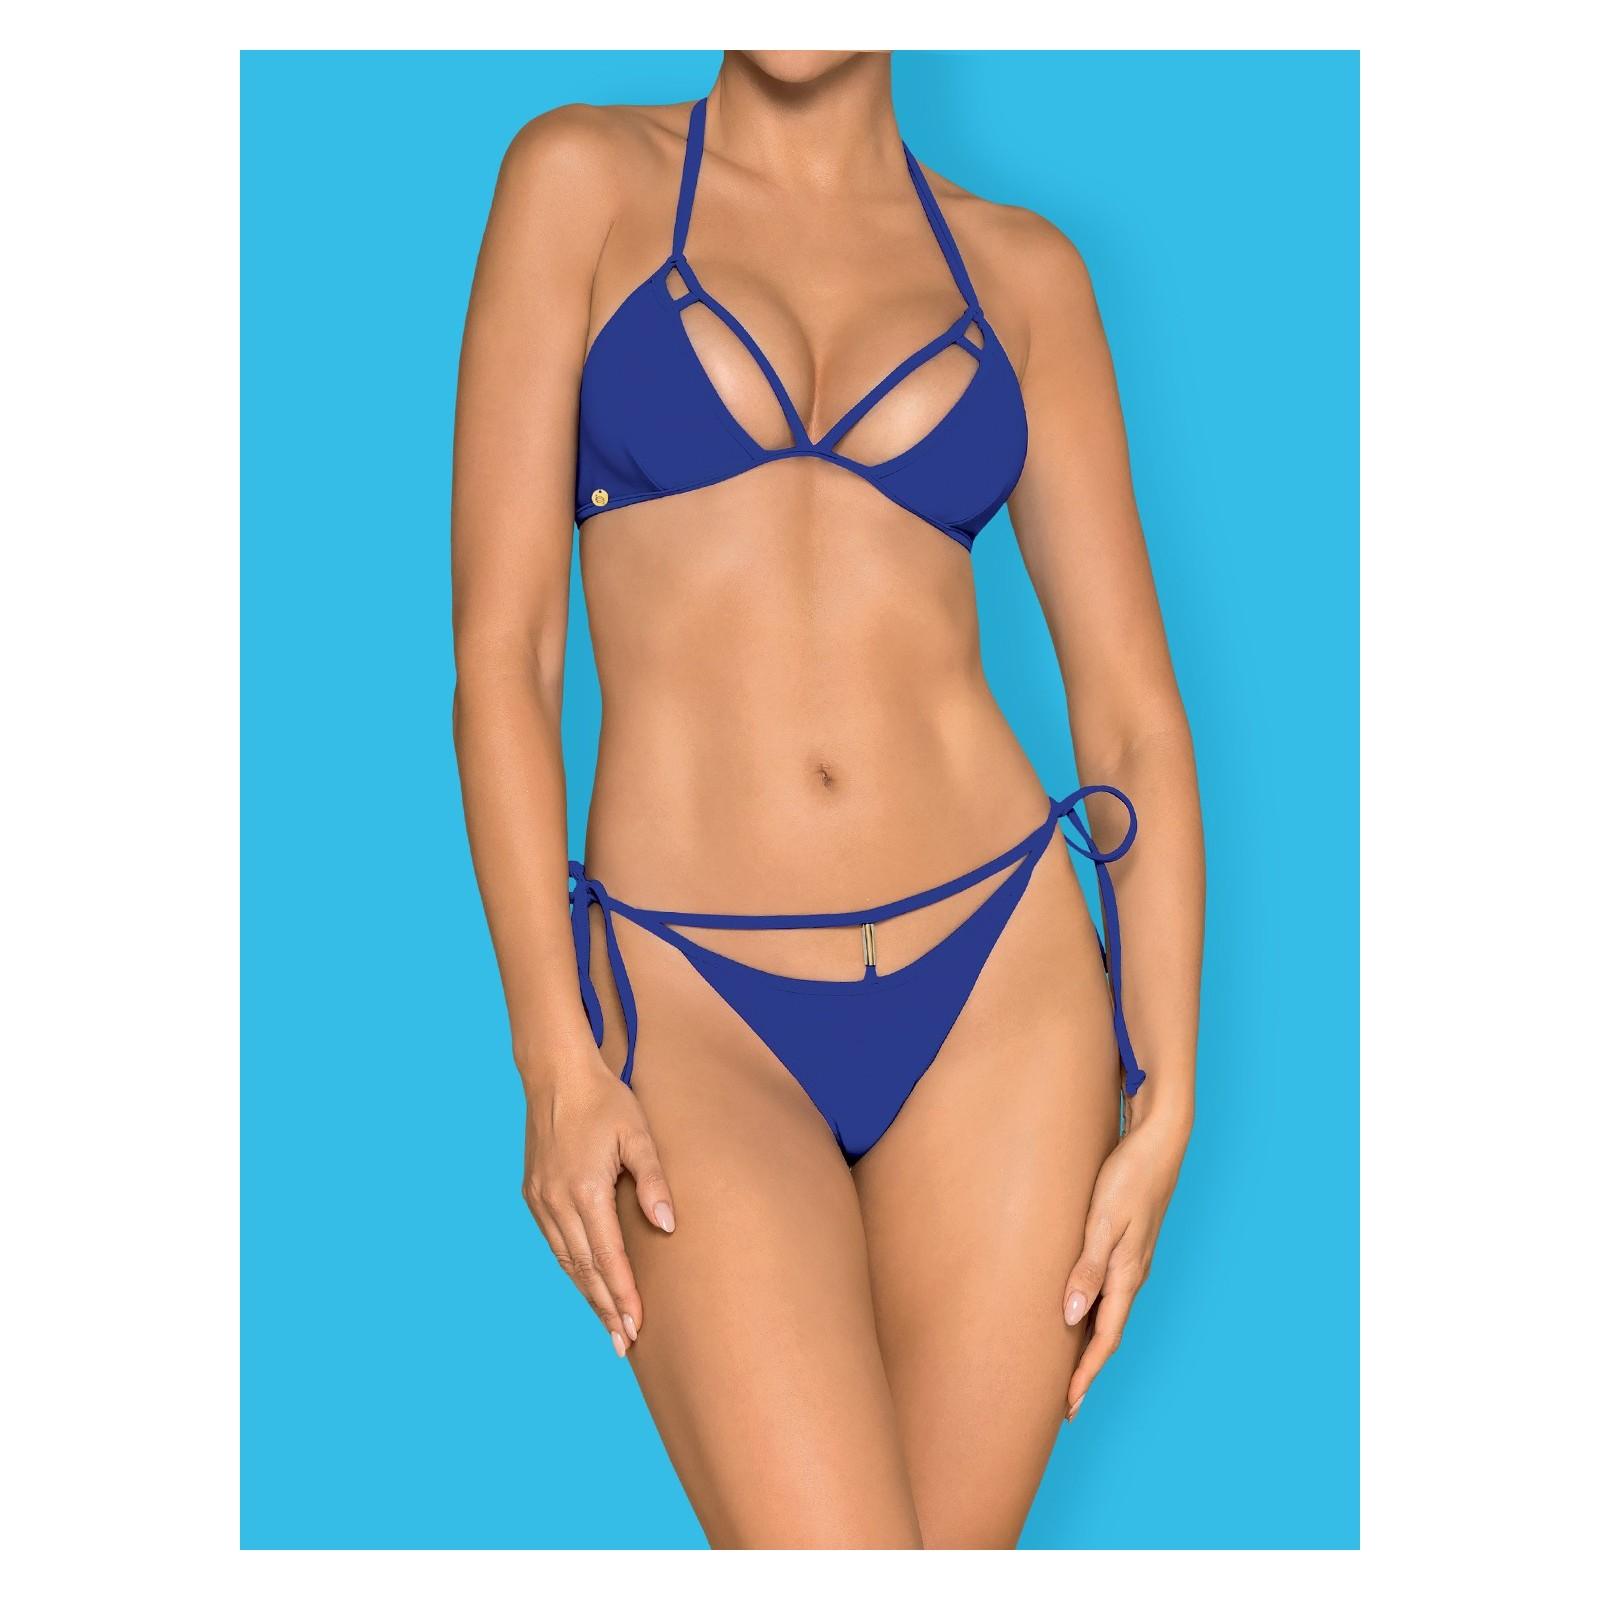 Bikini Costarica blau - 1 - Vorschaubild